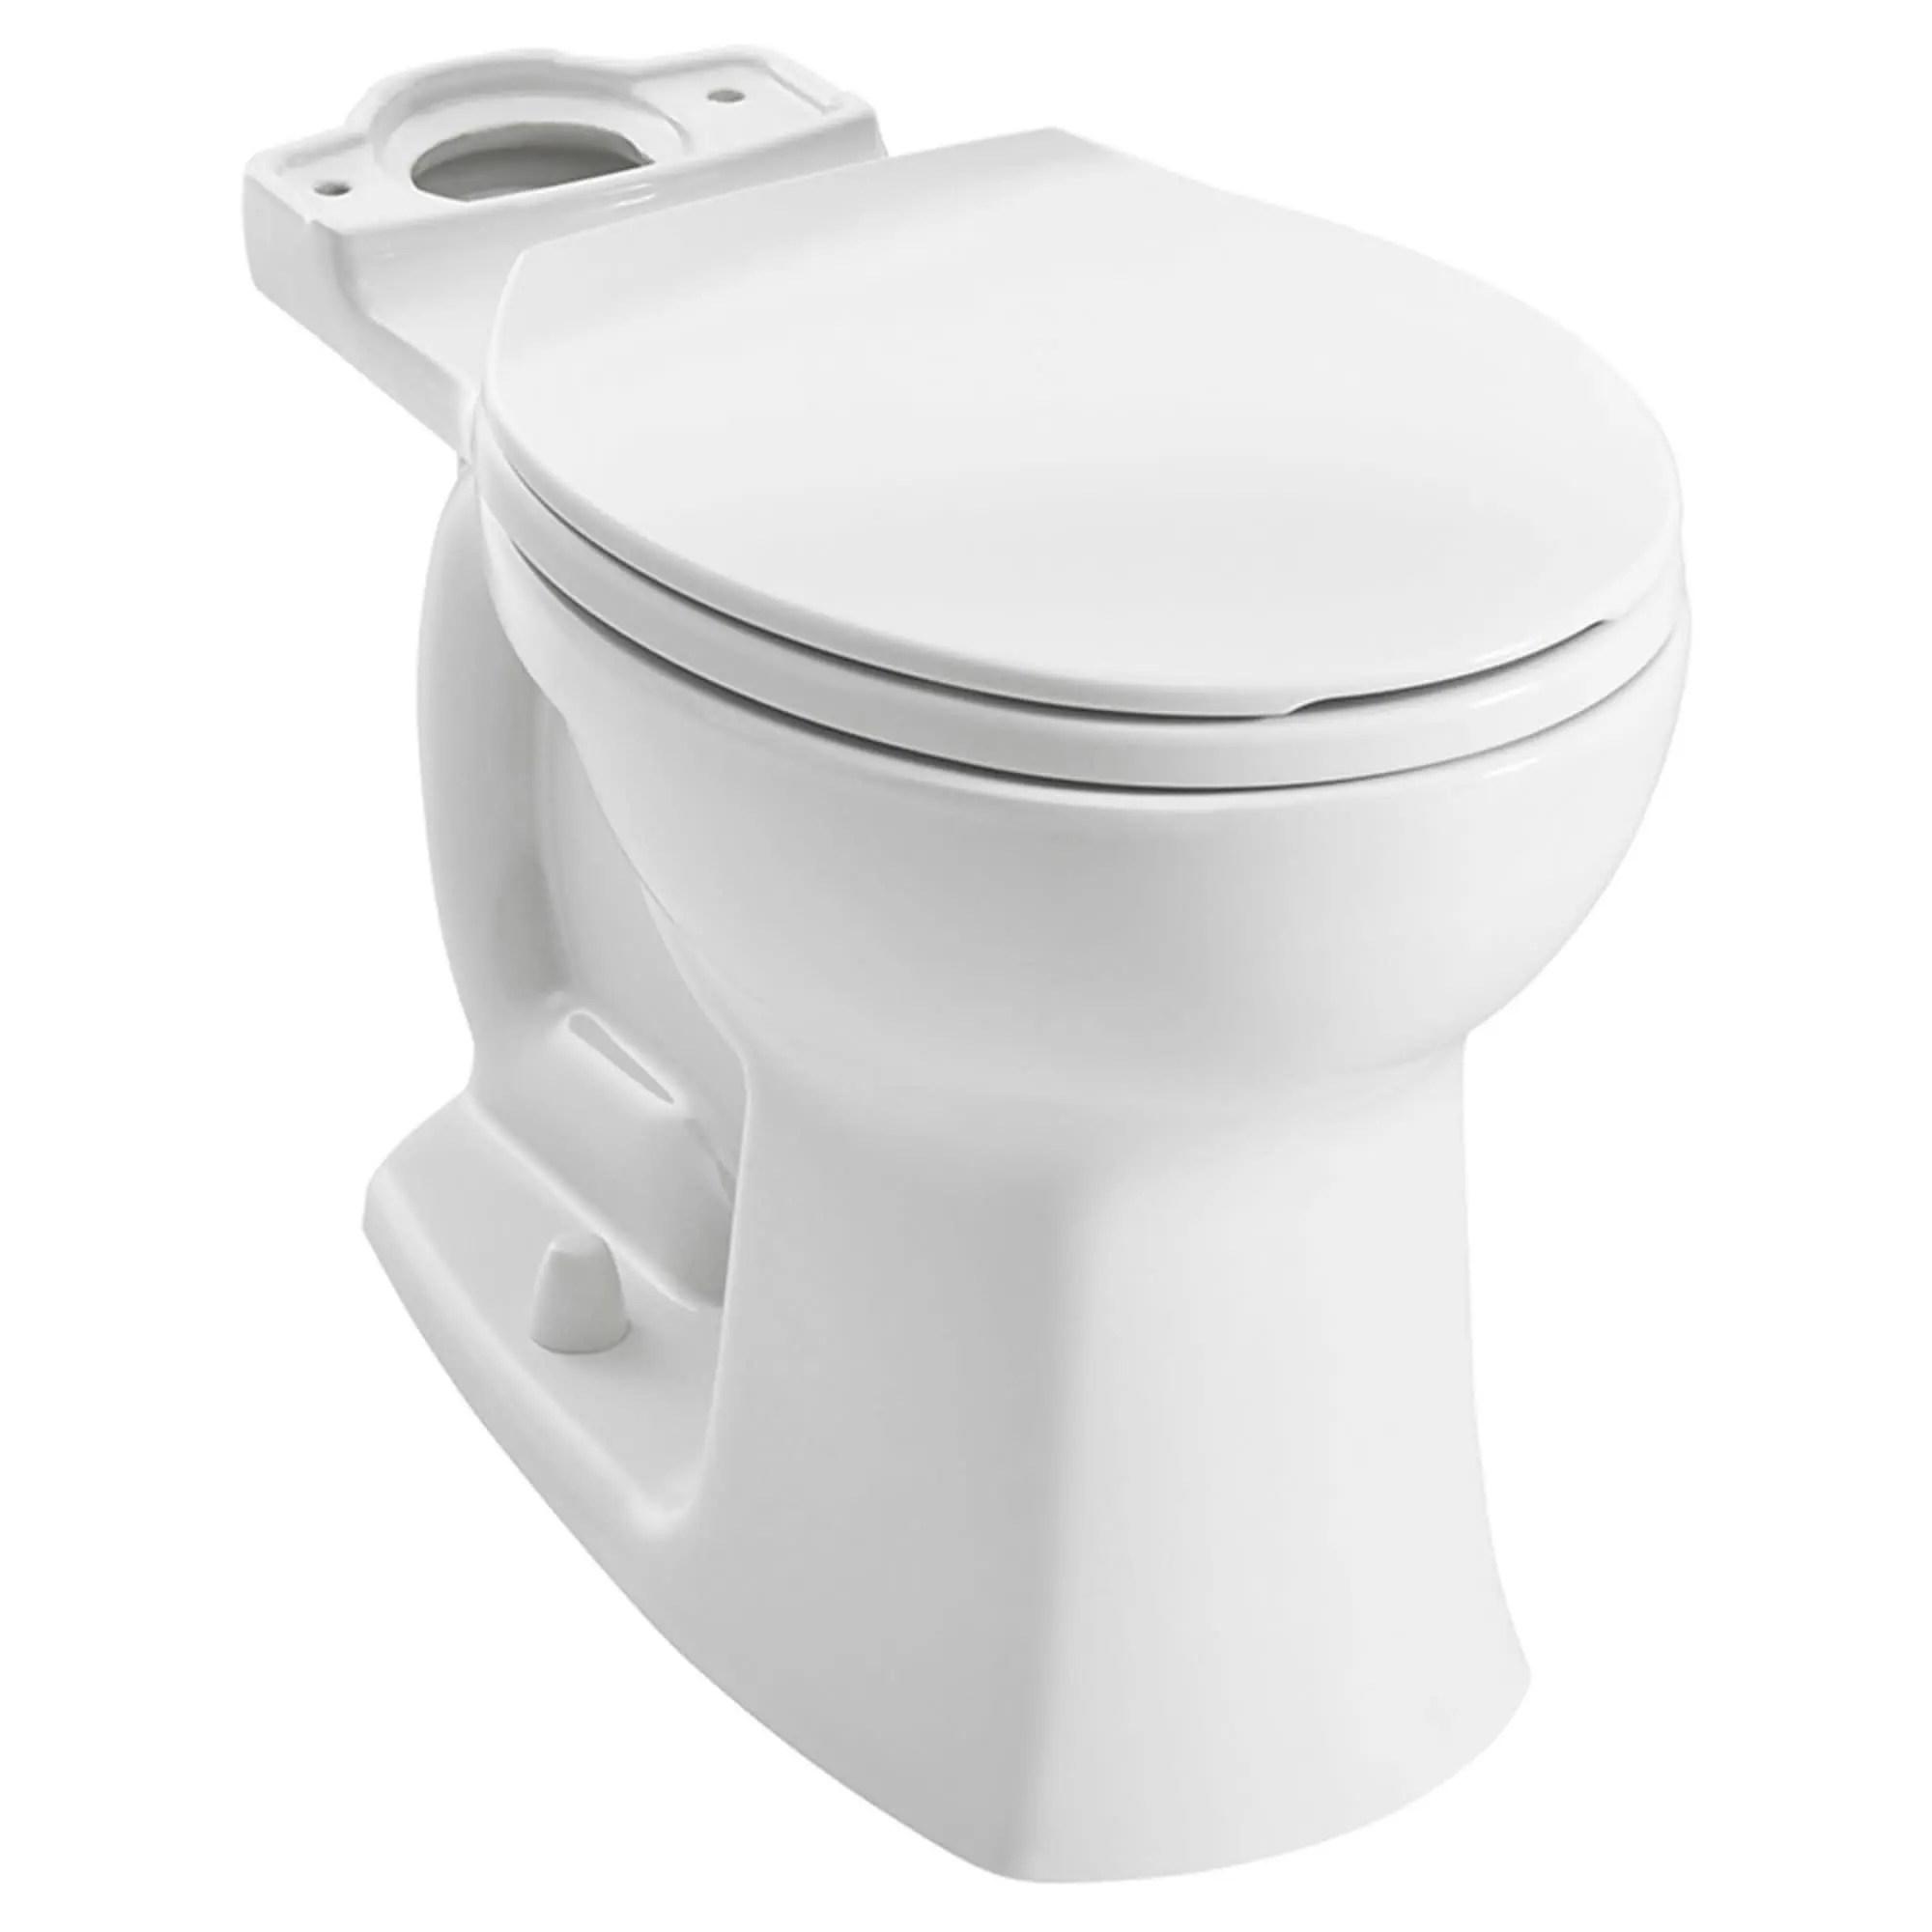 American Standard 3519b 101 Edgemere Round Comfort Height Toilet Bowl White Overstock 25646977